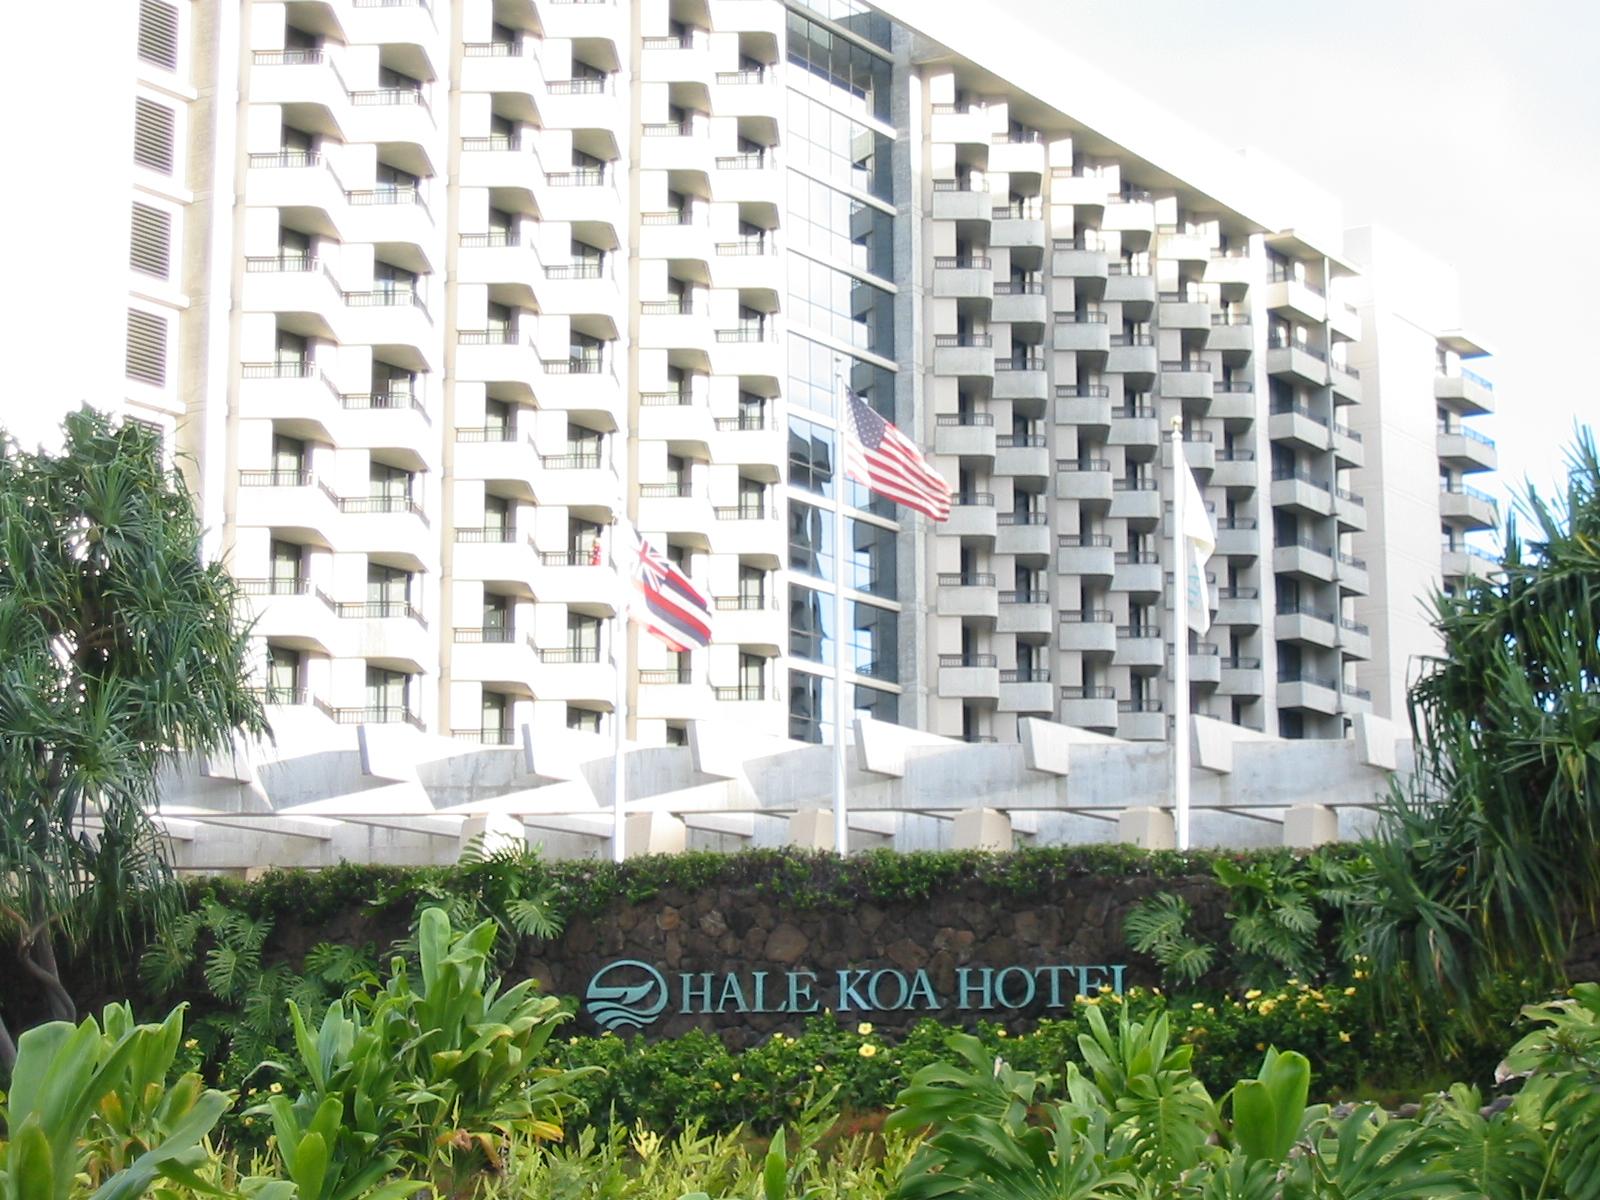 Hale Koa Rooms Reservations Eligibility